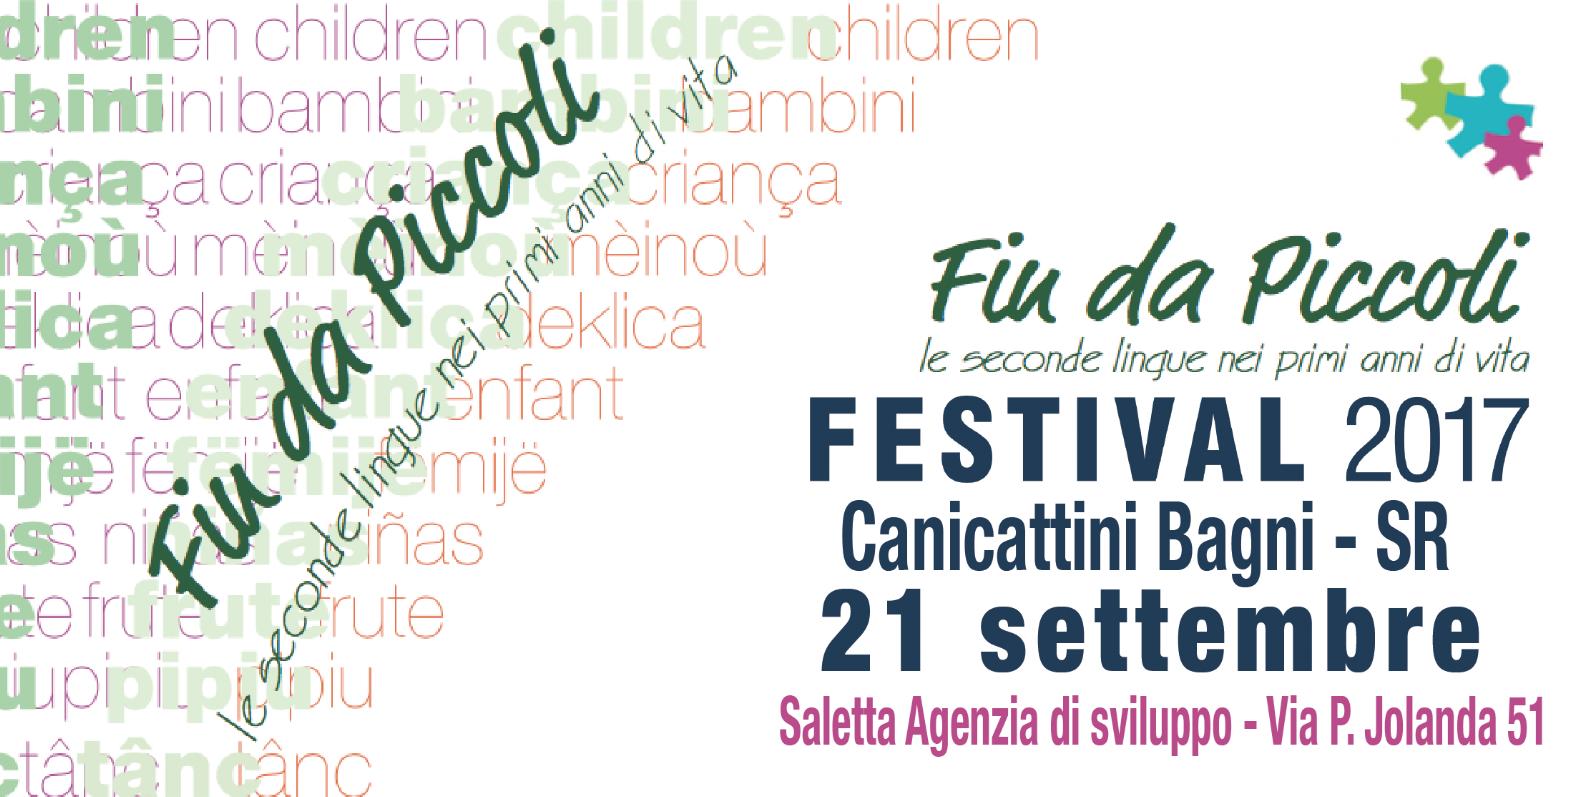 Locandina_programma_Festival_Canicattini_Bagni.png